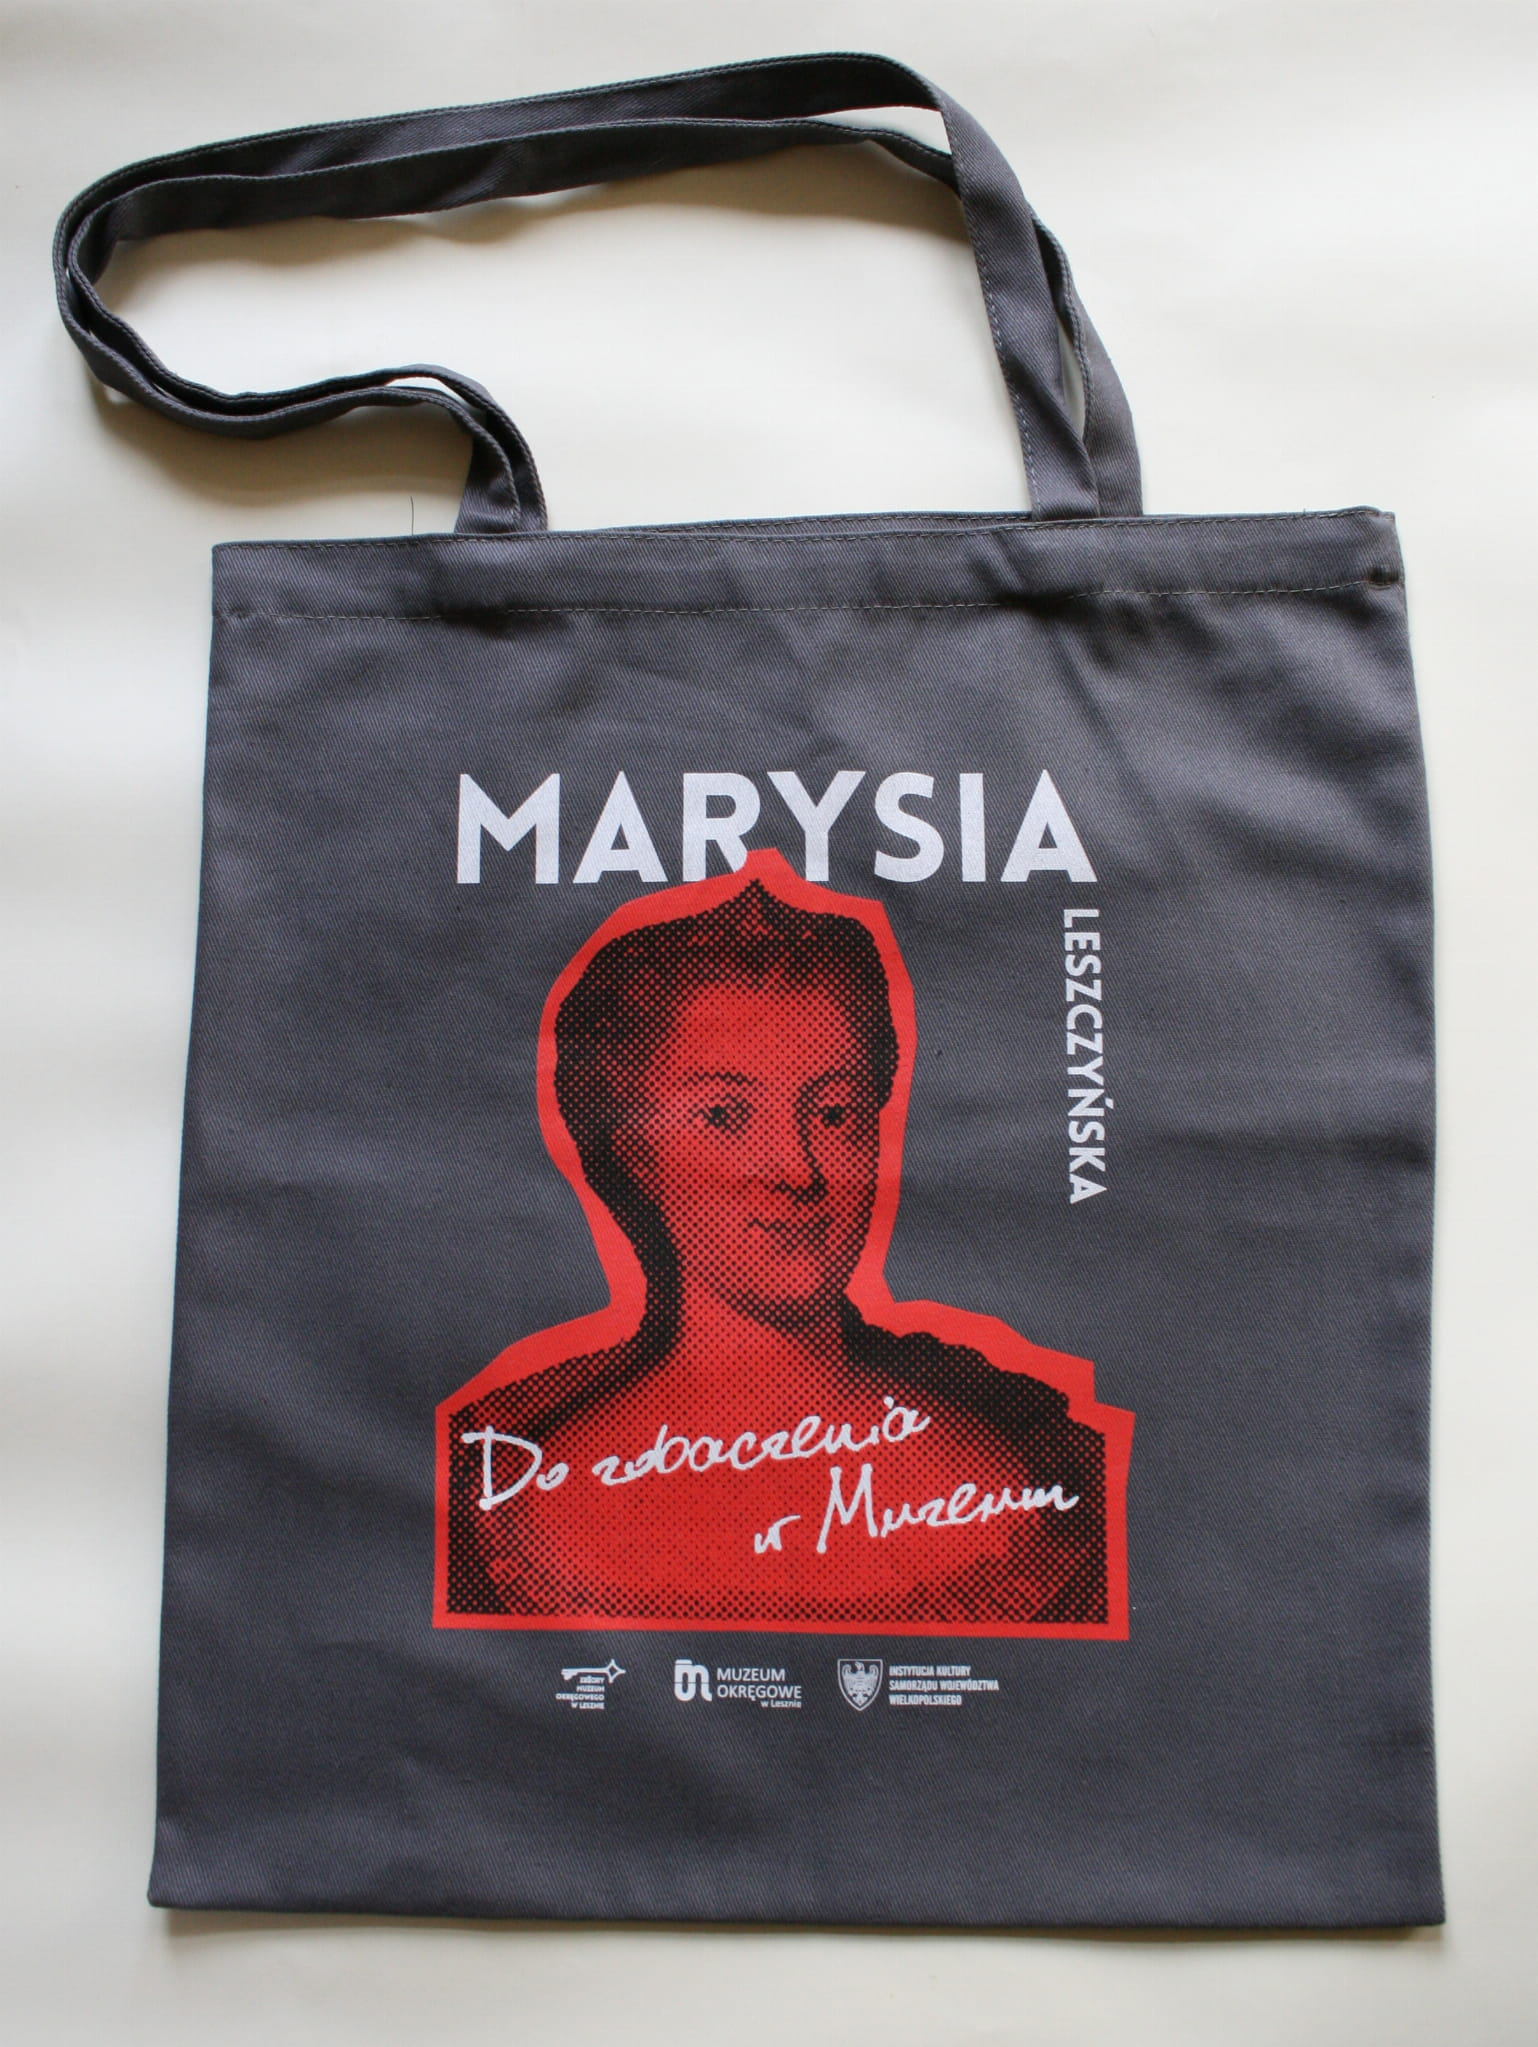 marysia muzeum leszno torba - muzeum.leszno.pl